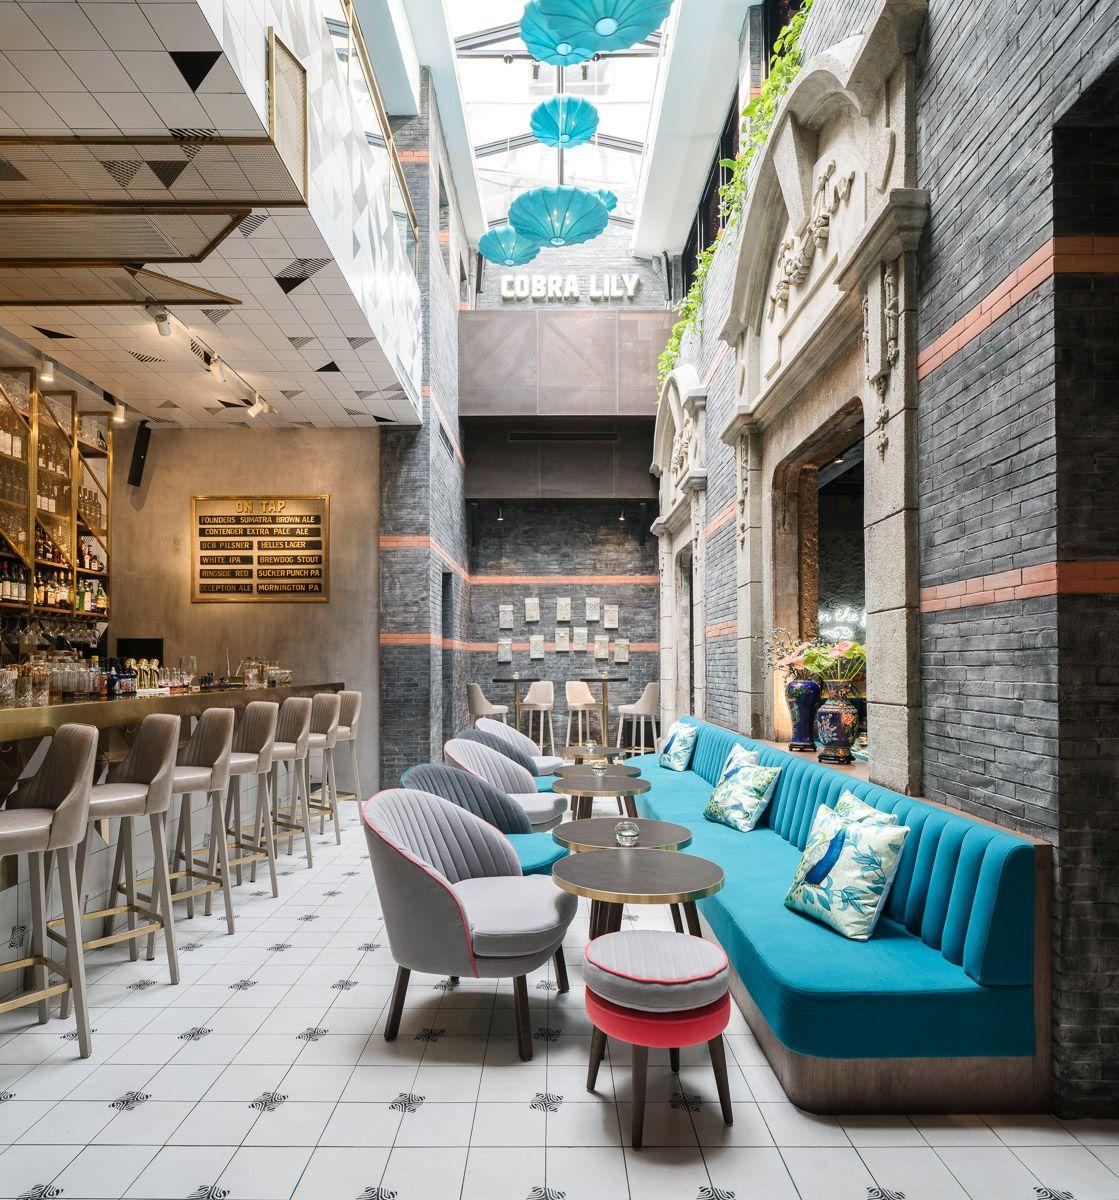 cobra lily, pan-asian restaurant & bar in shanghai. designed